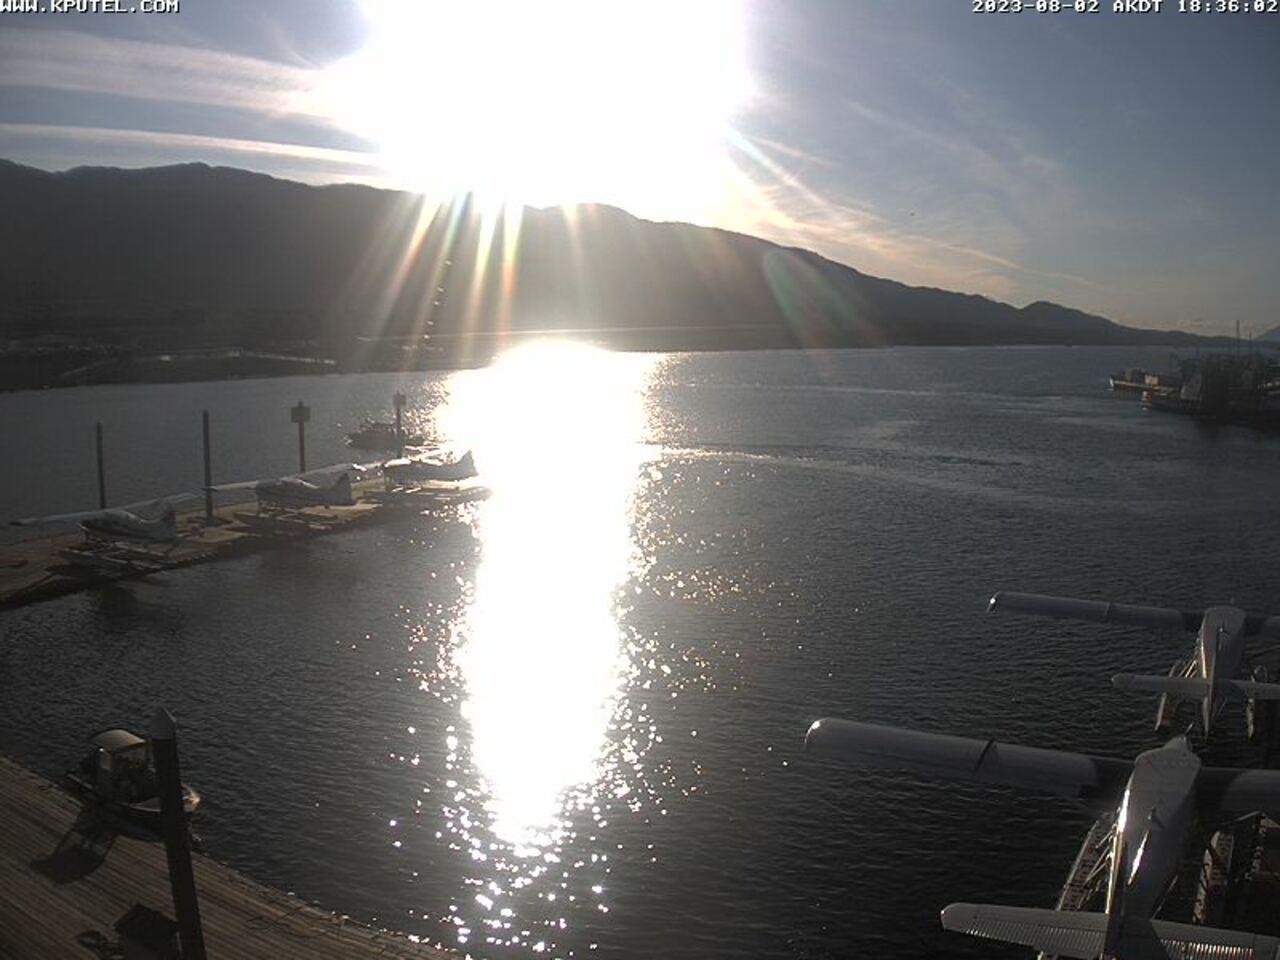 Current Ketchikan Webcam #5 Alaska-sized Image